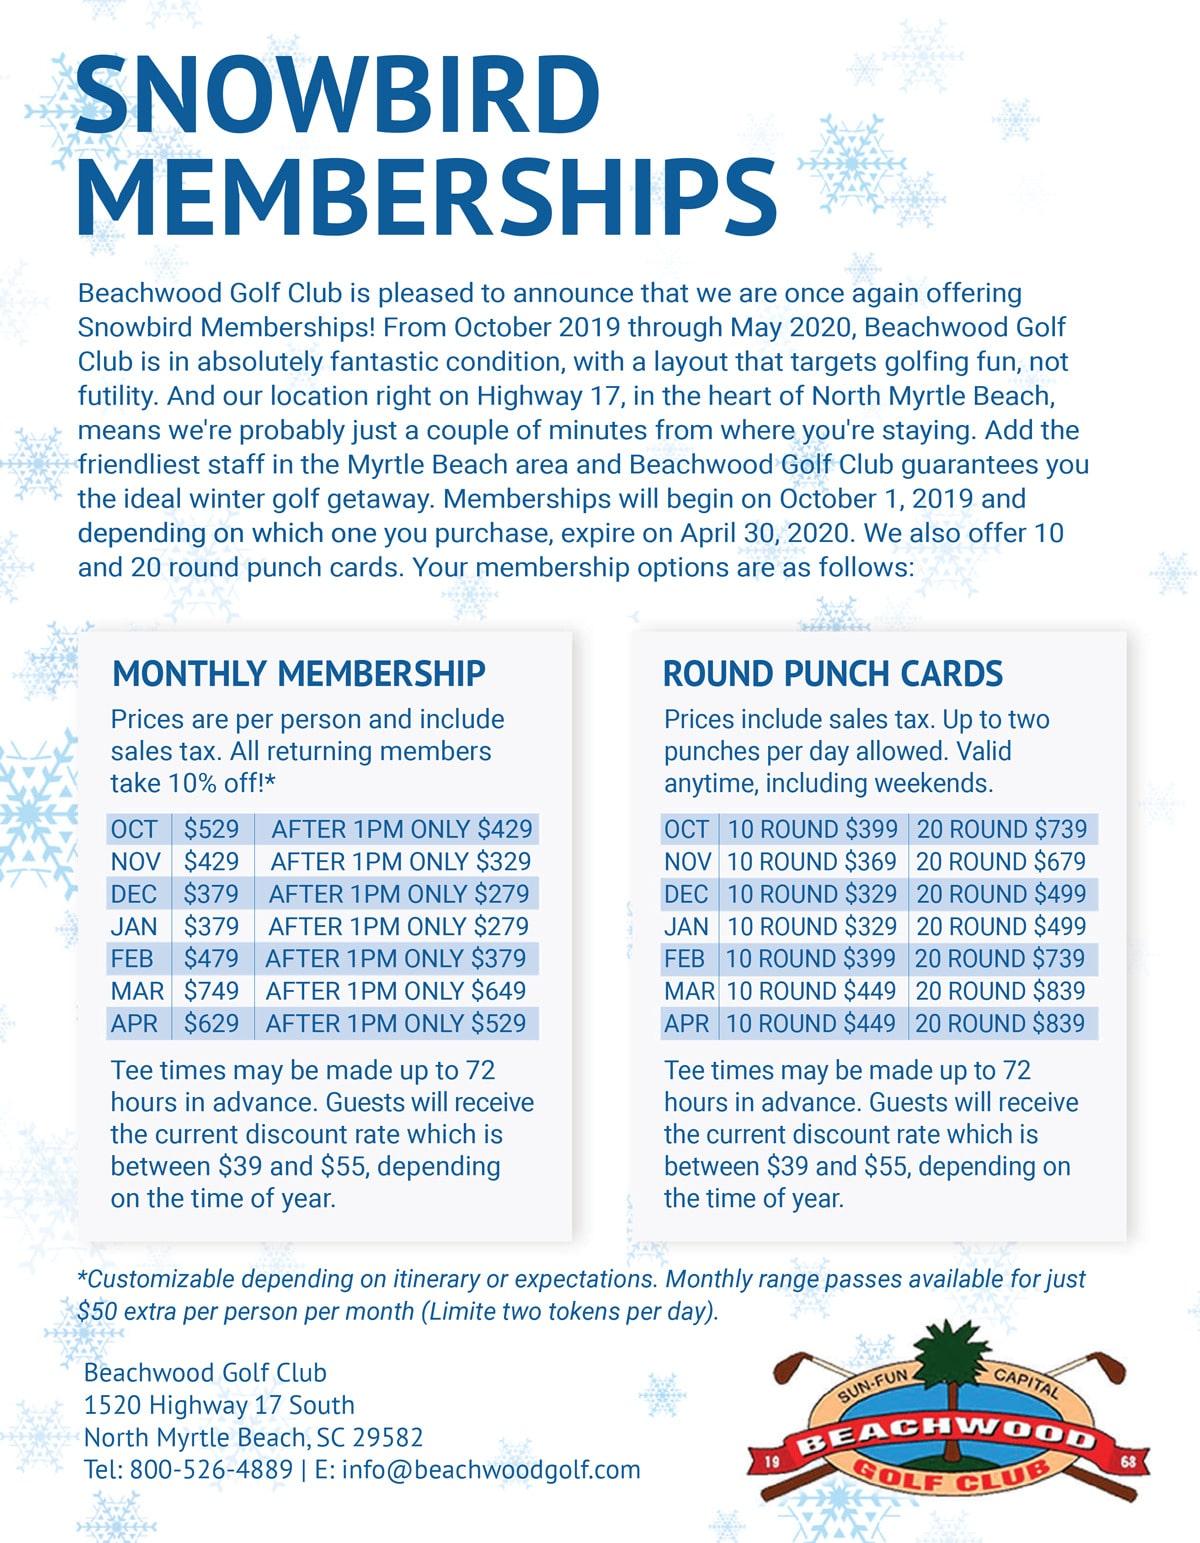 Snowbird Golf Membership for Beachwood Golf Club in North Myrtle Beach